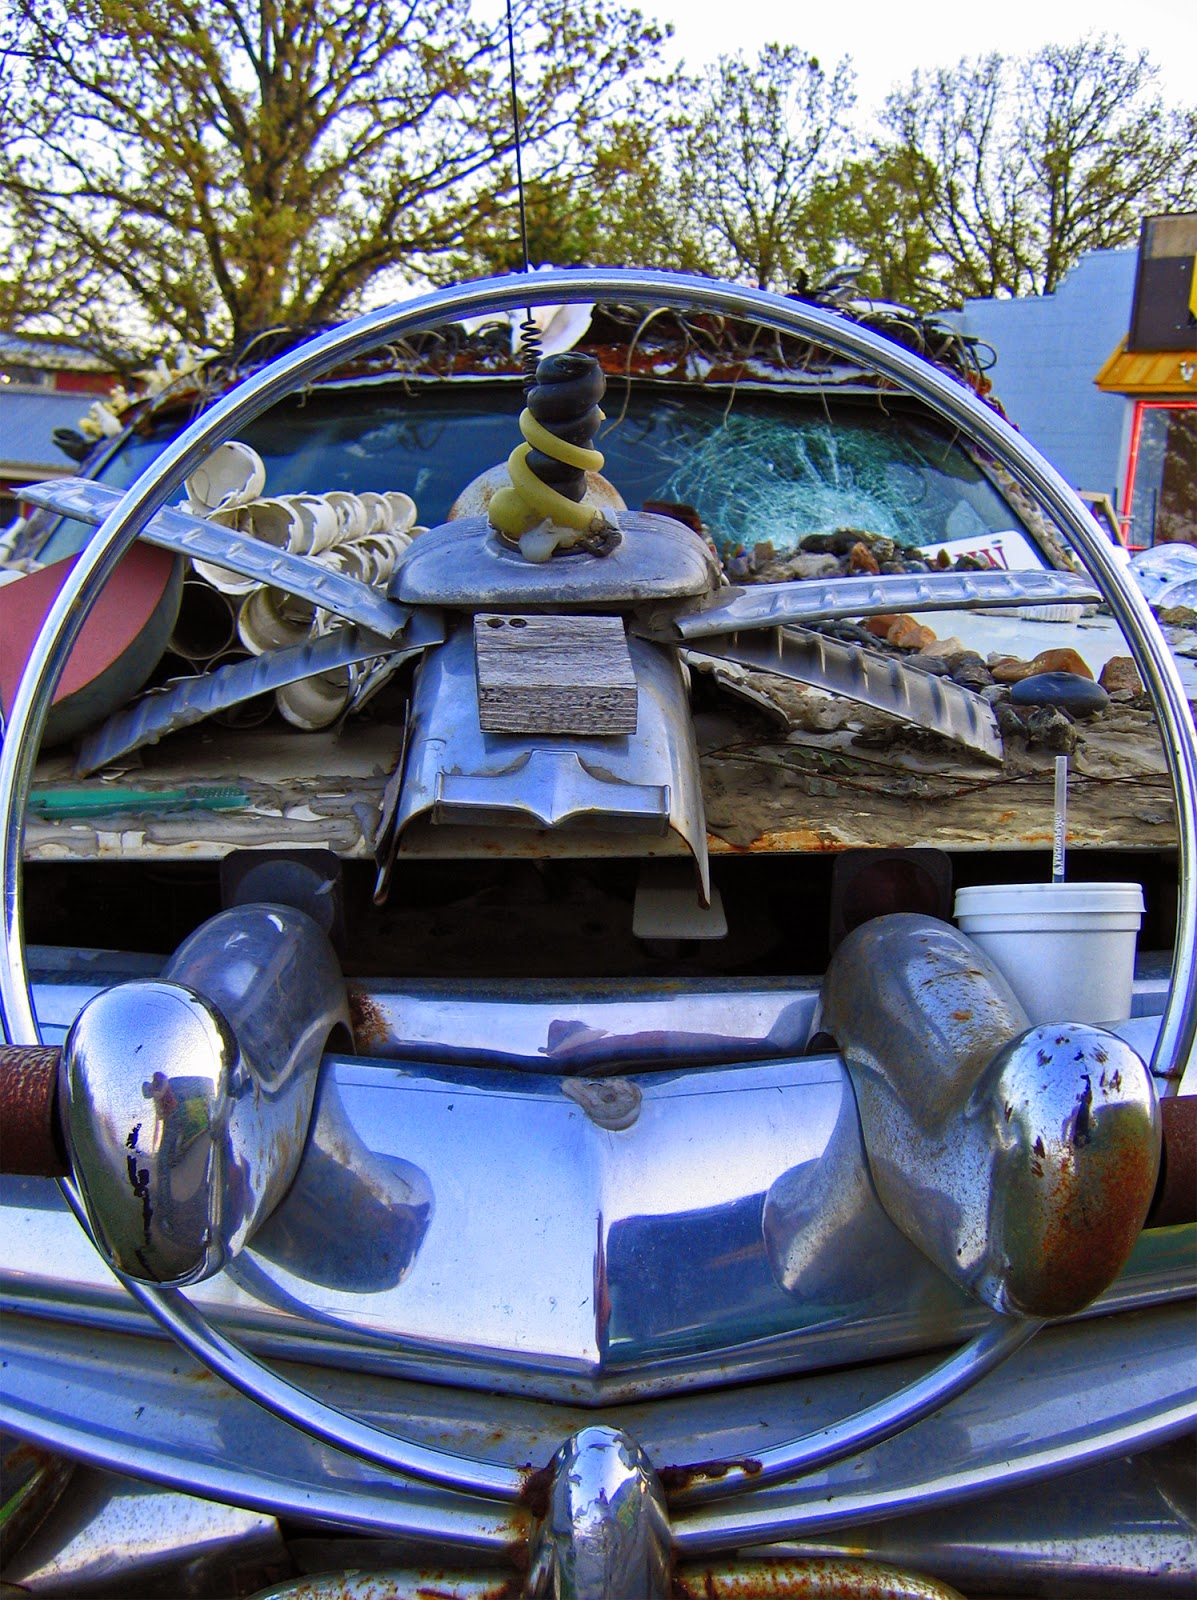 Neato Coolville: THE JUNK ART CAR OF BRANSON